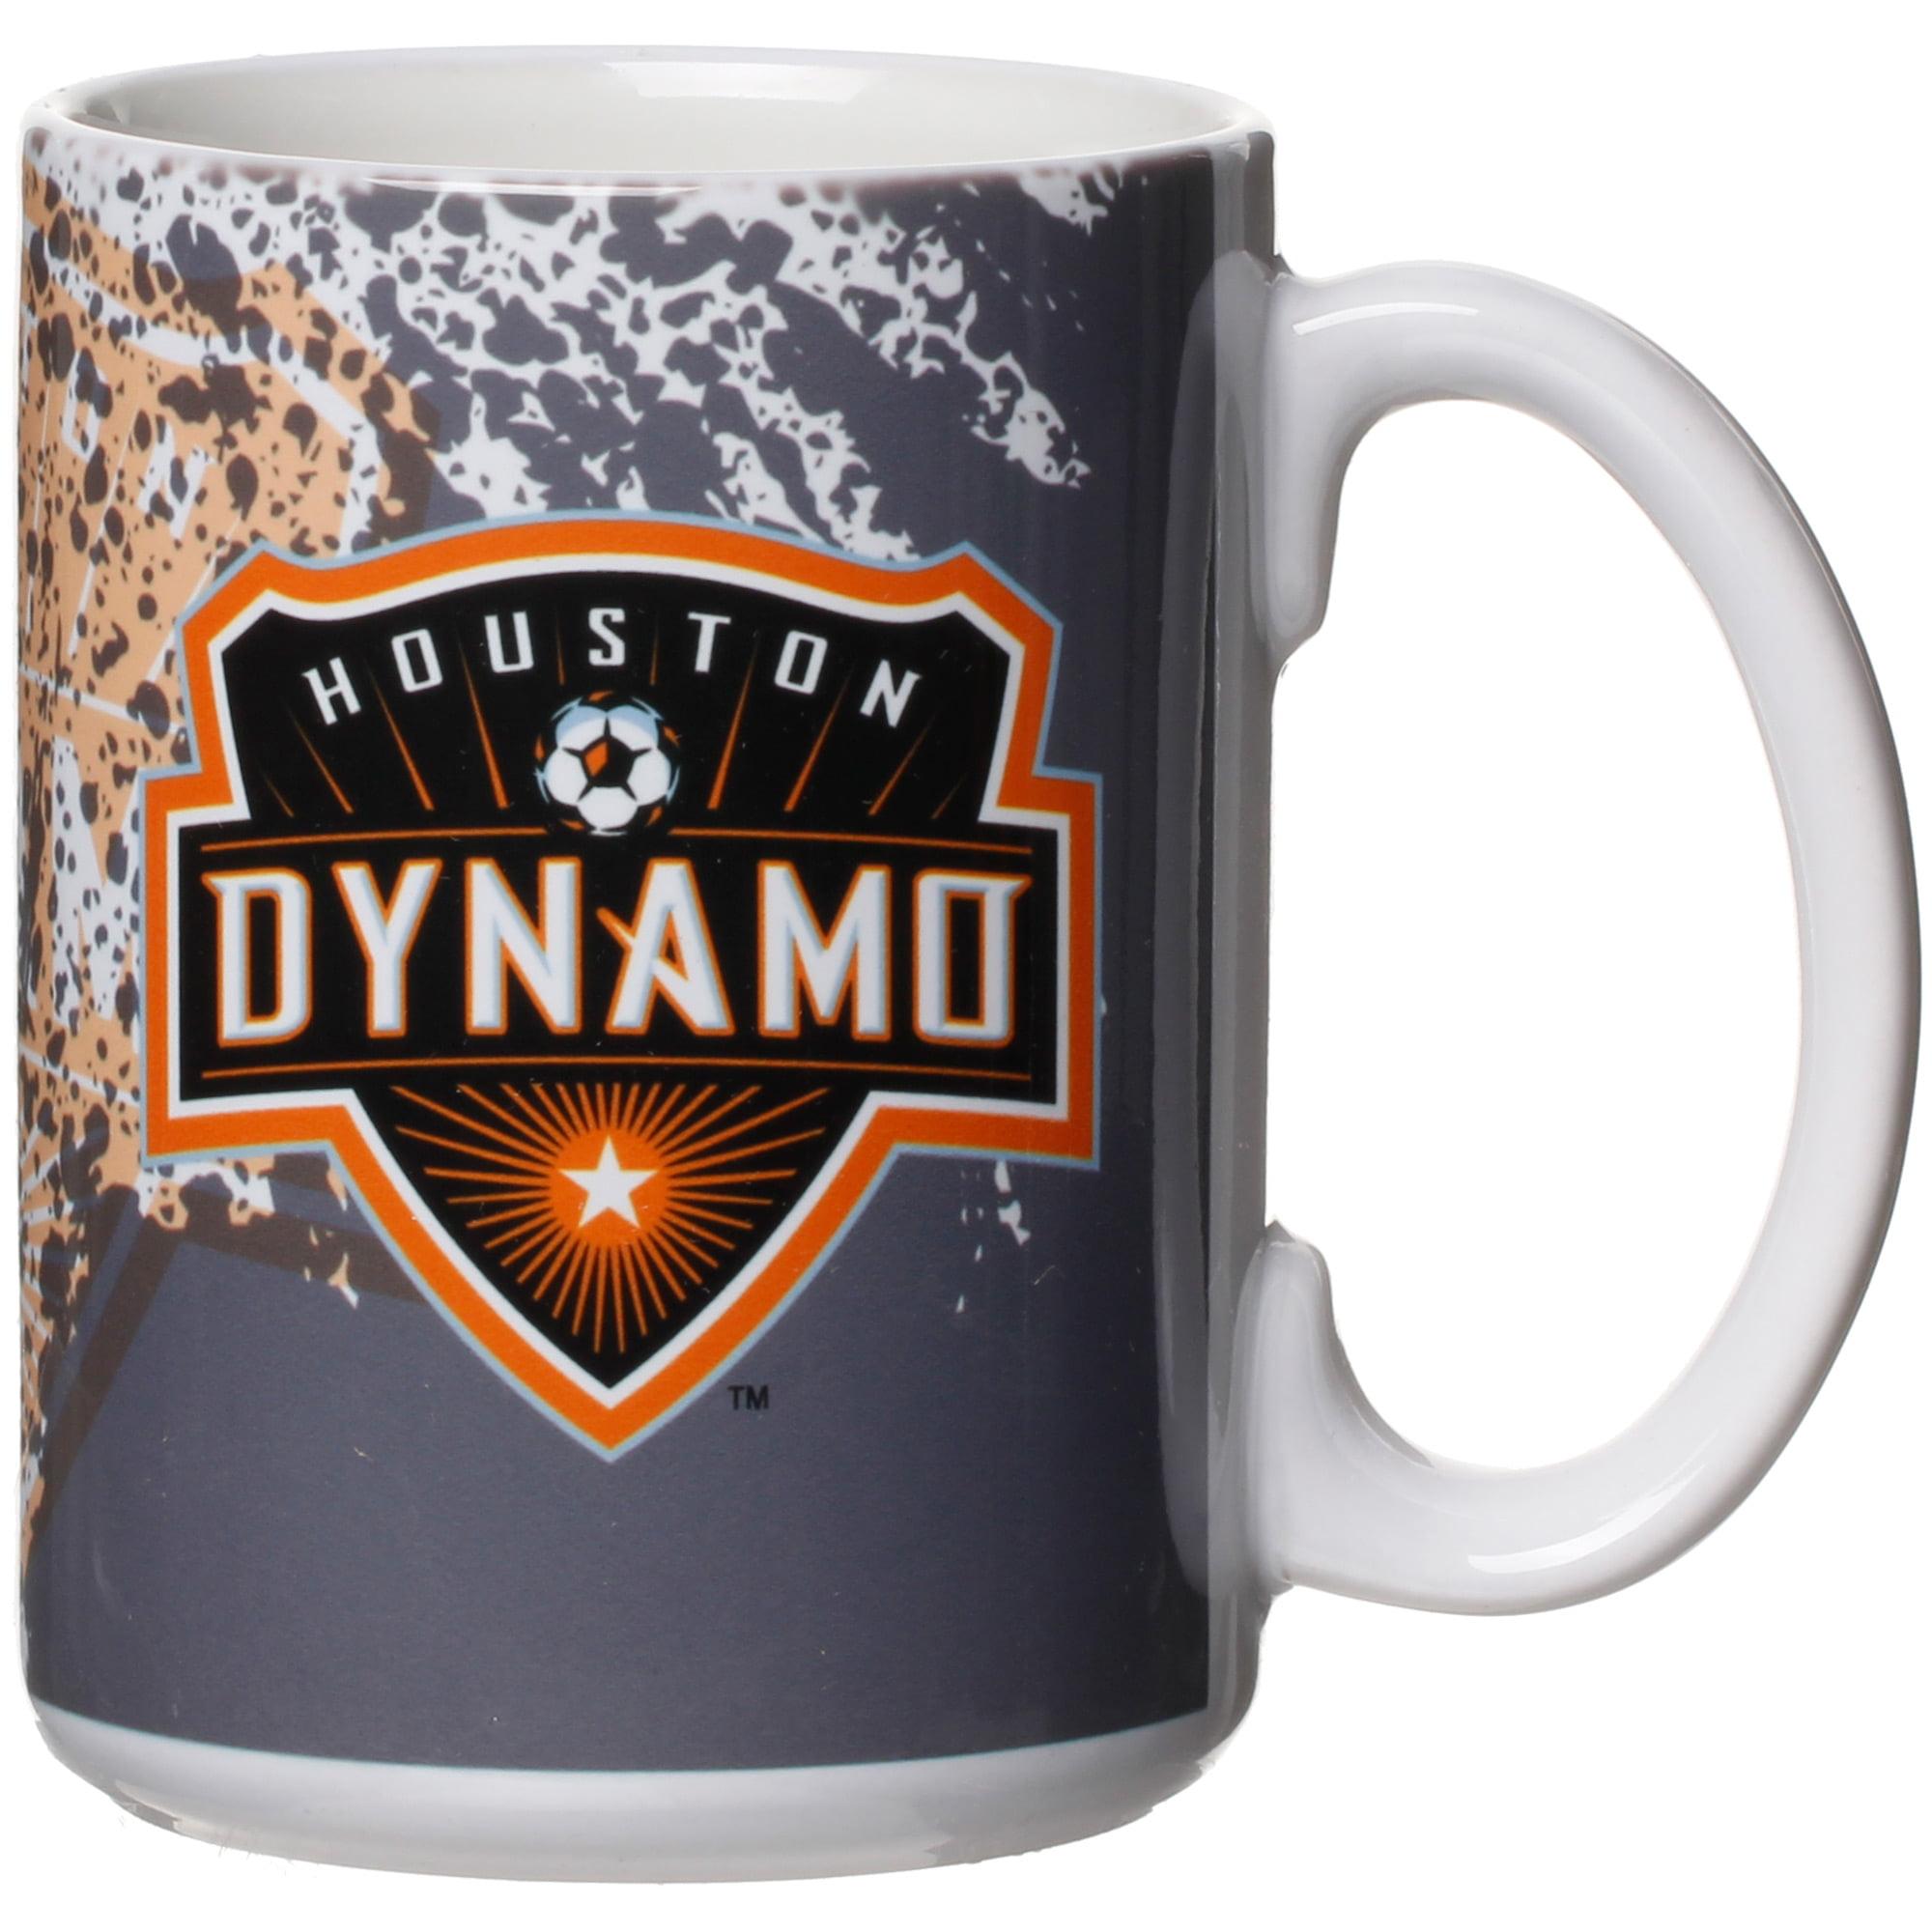 Houston Dynamo 15oz. Ceramic Mug - No Size